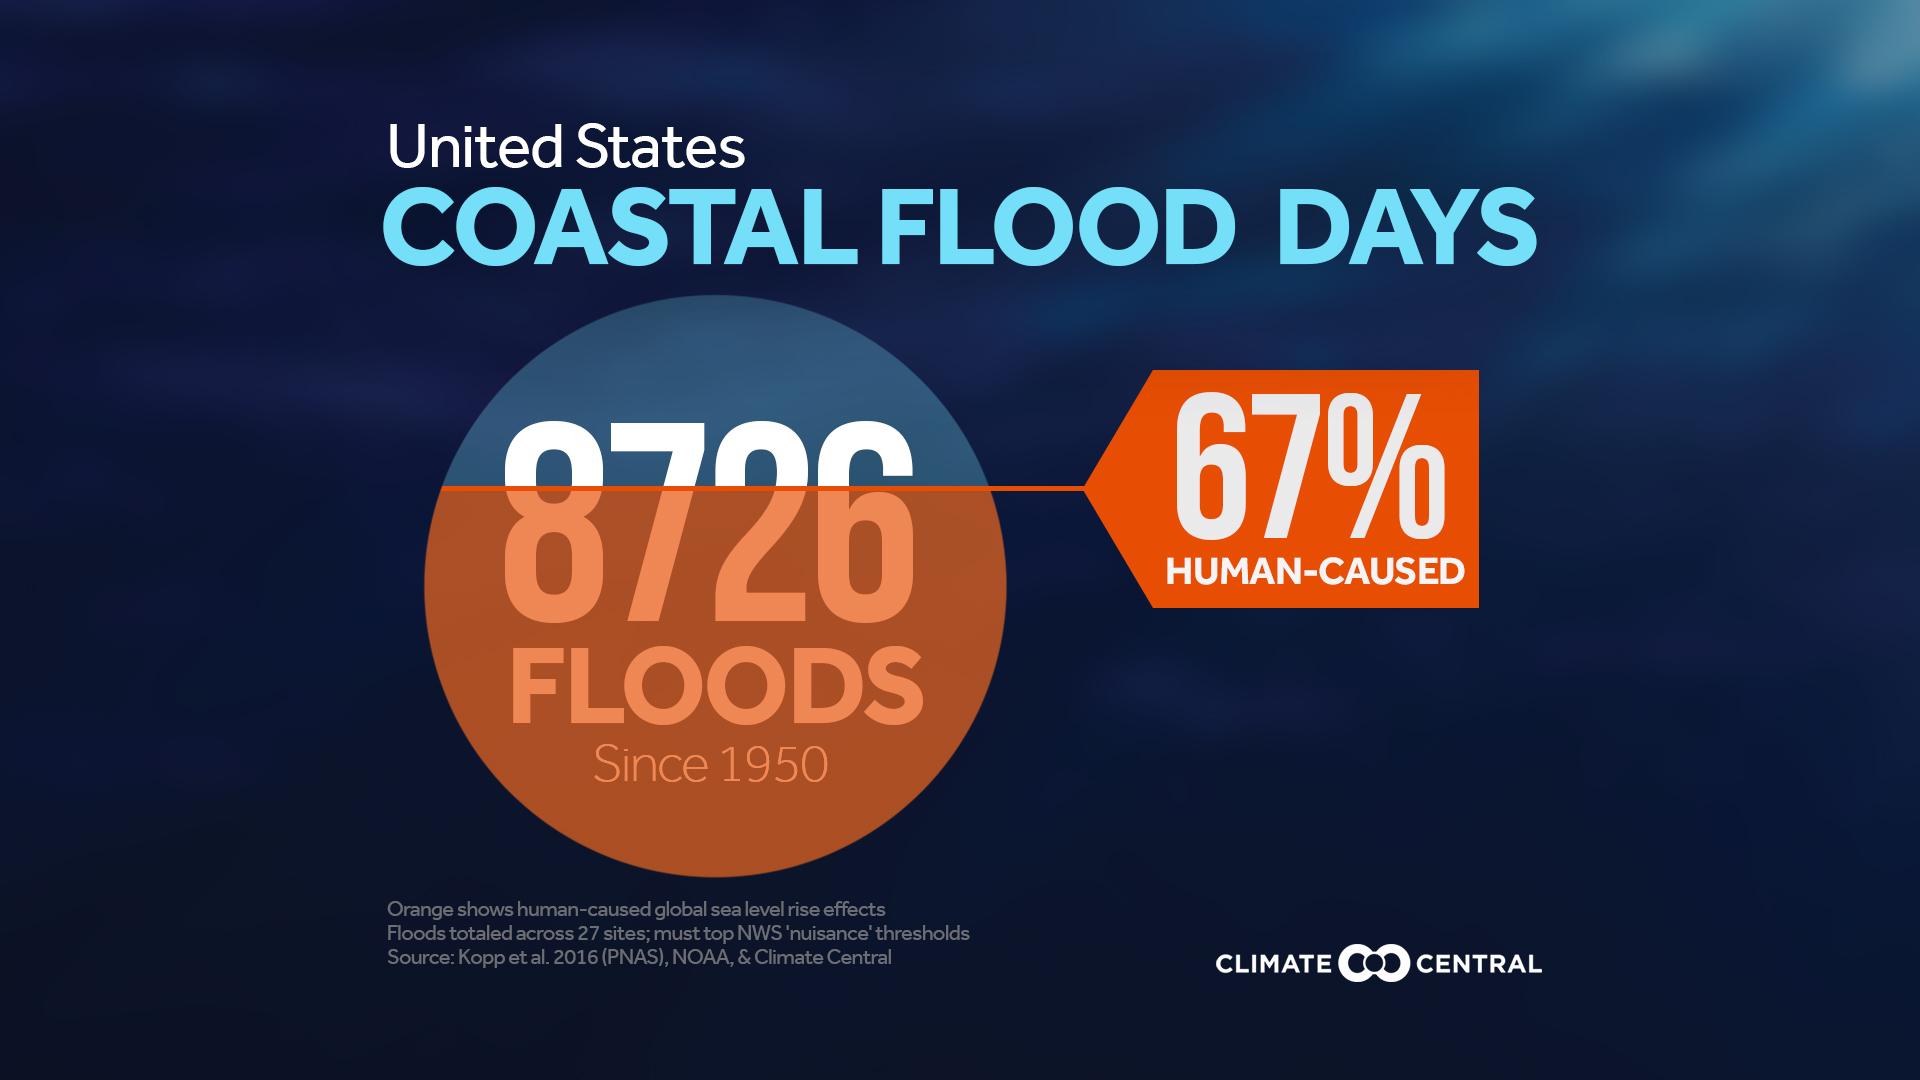 coastal flood days in the U.S.